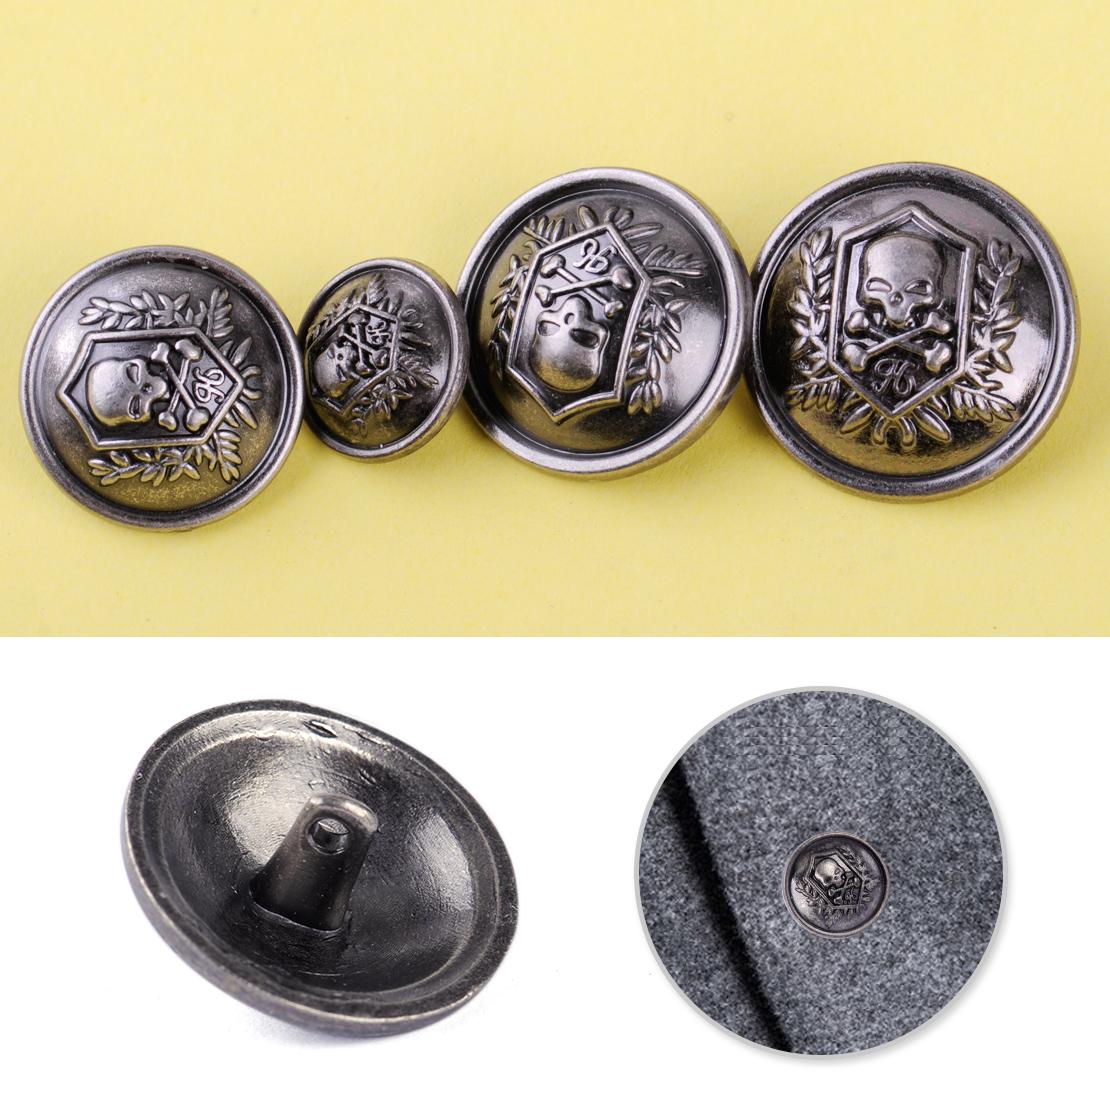 10pcs Skull Crossbones Shank Buttons Metal Sewing Button Coat Embellishment DIY